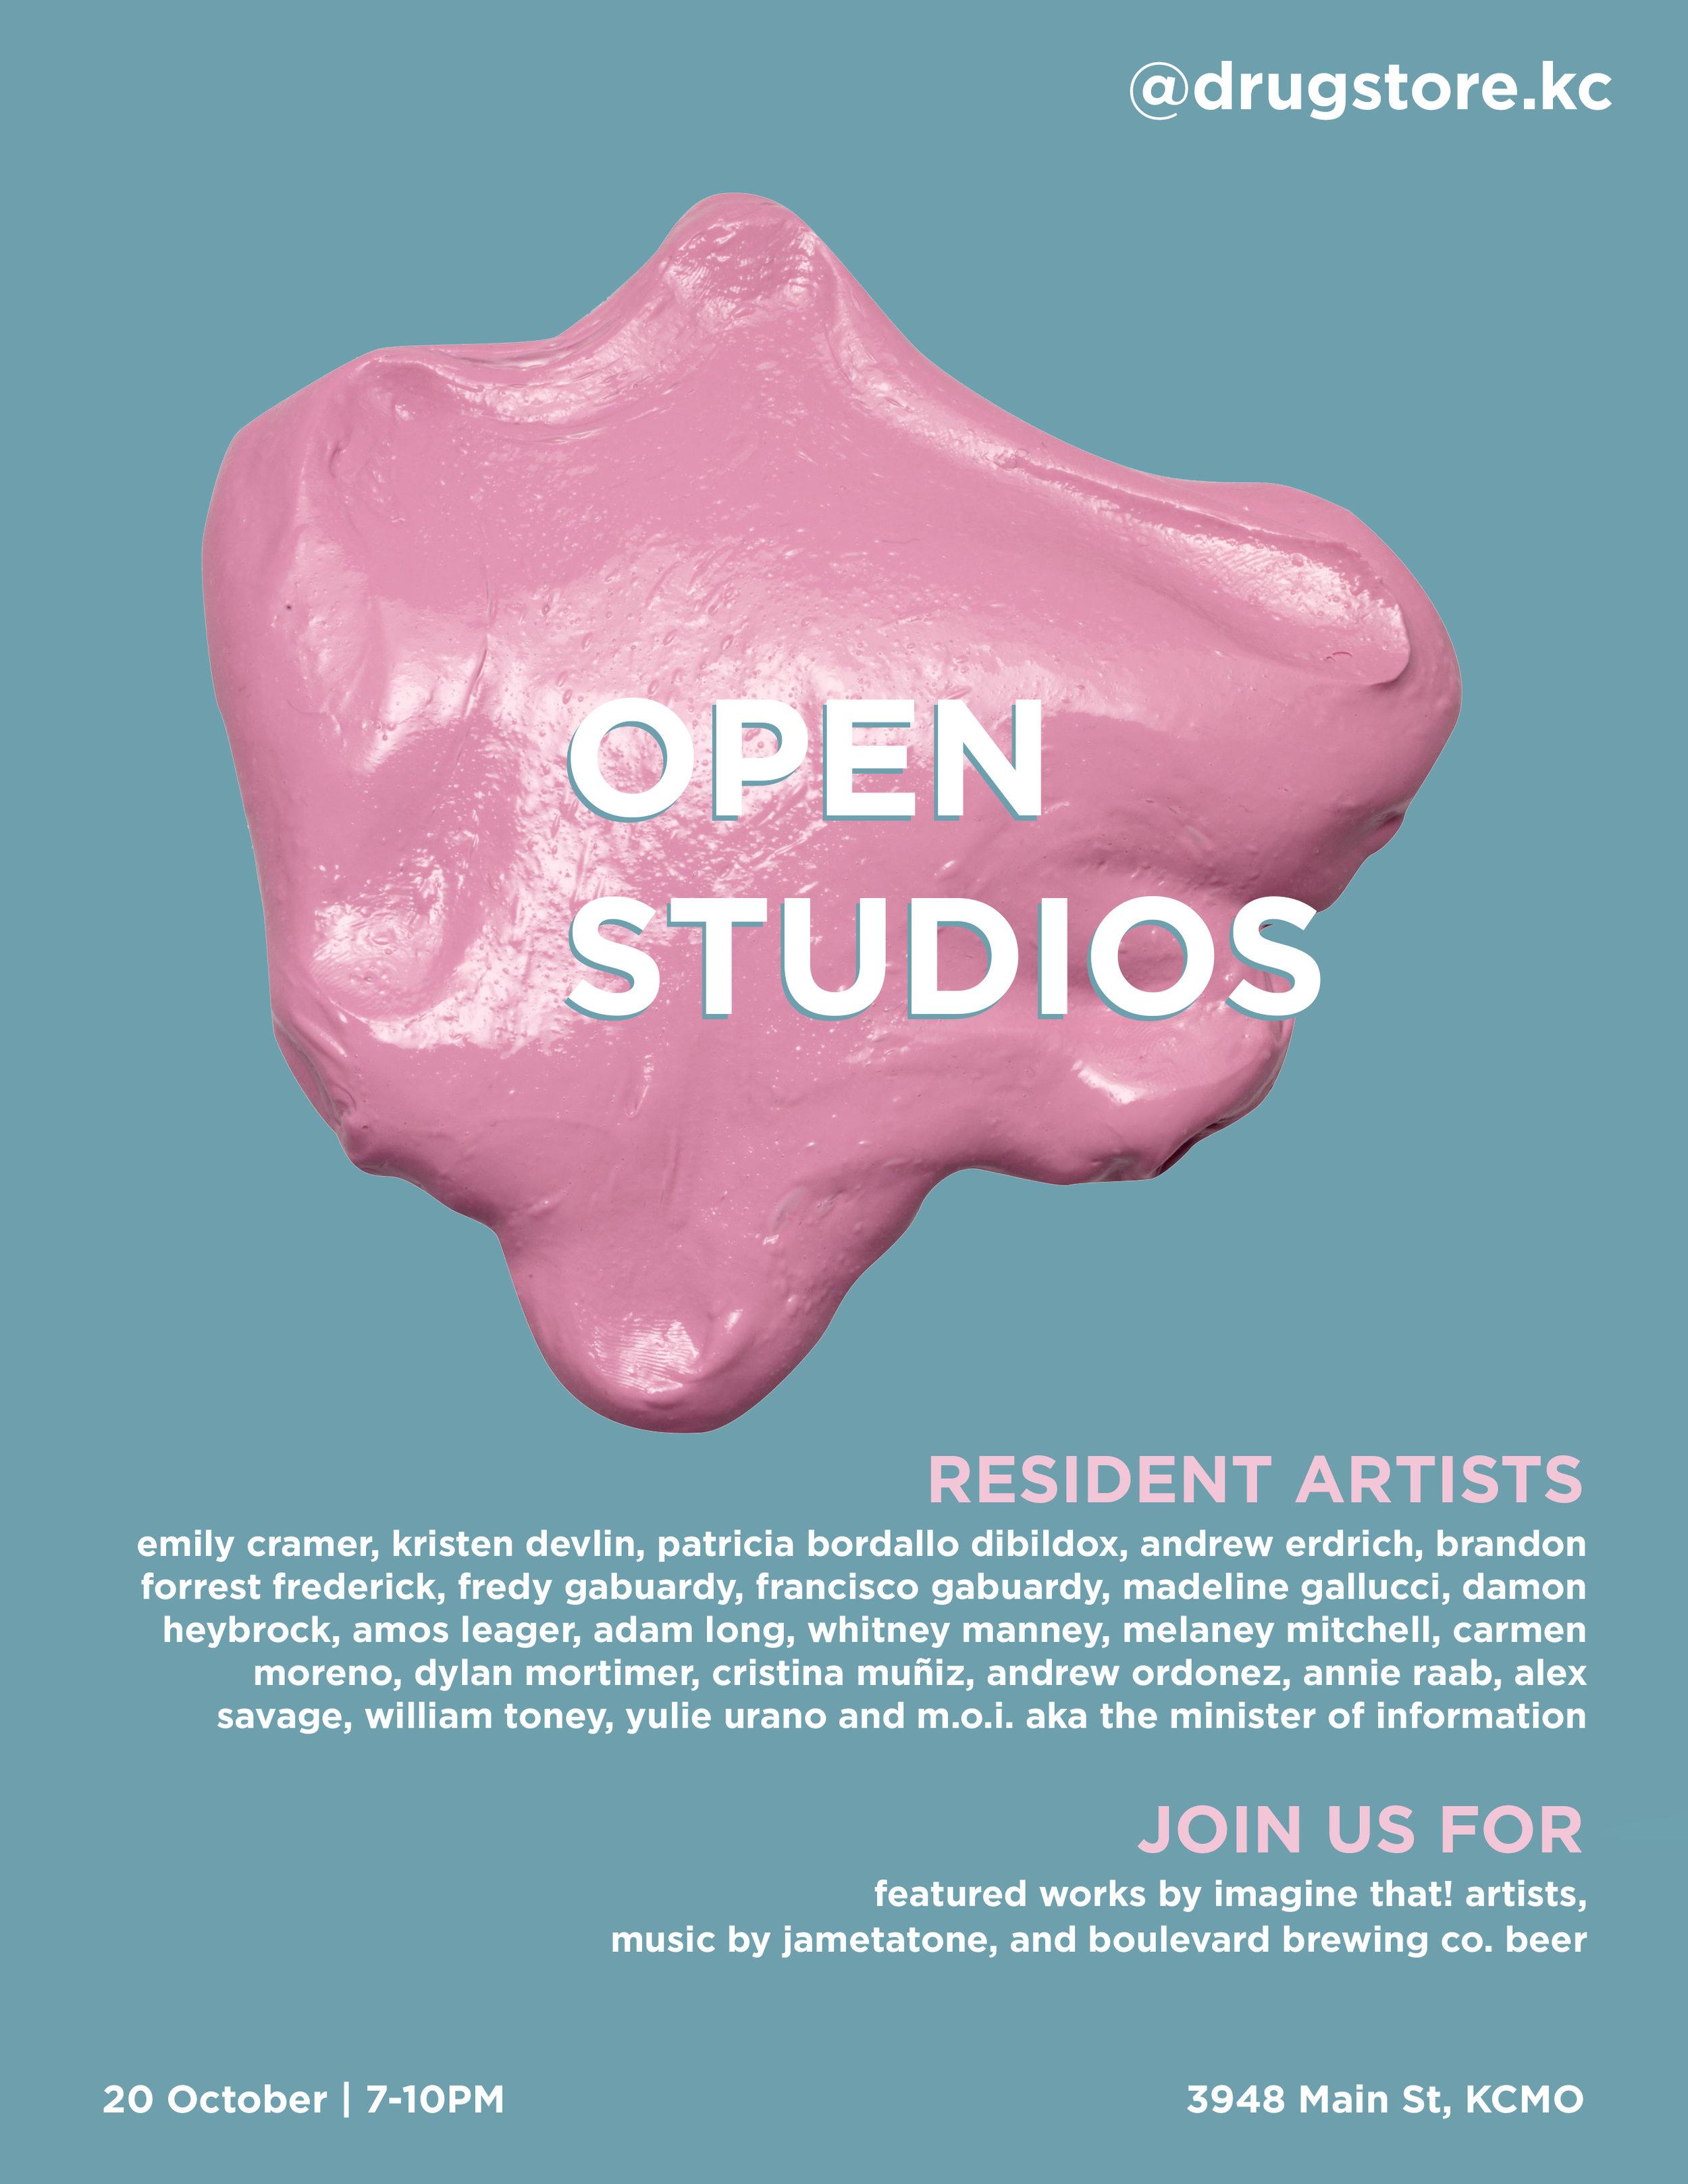 Drugstore_Open_Studios_FA17_Flyer.jpg